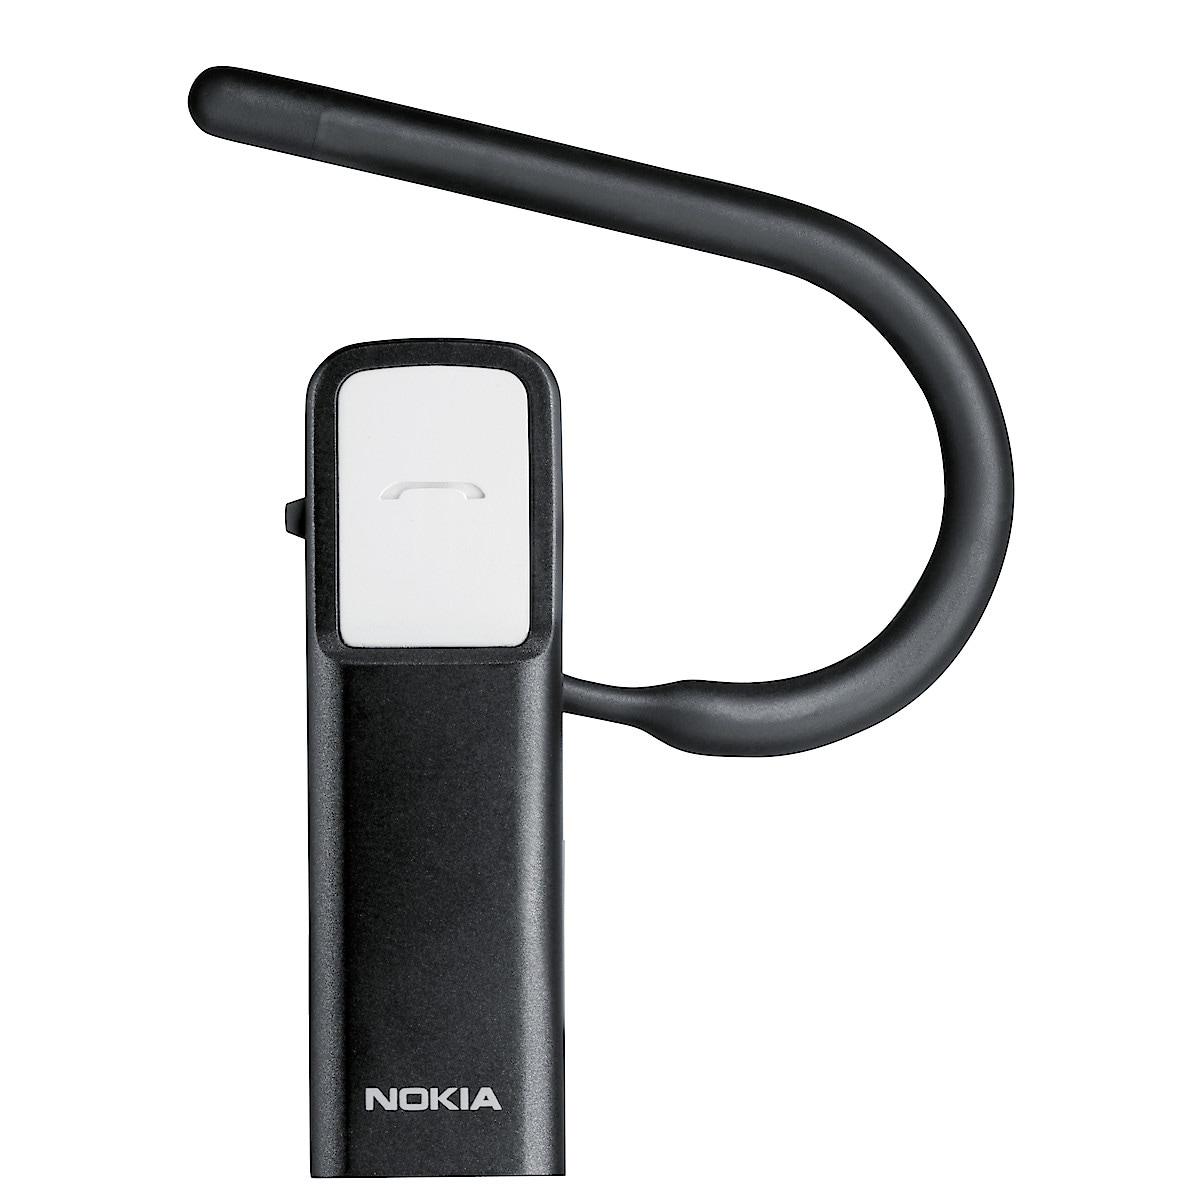 Trådløst headset, Nokia BH-606